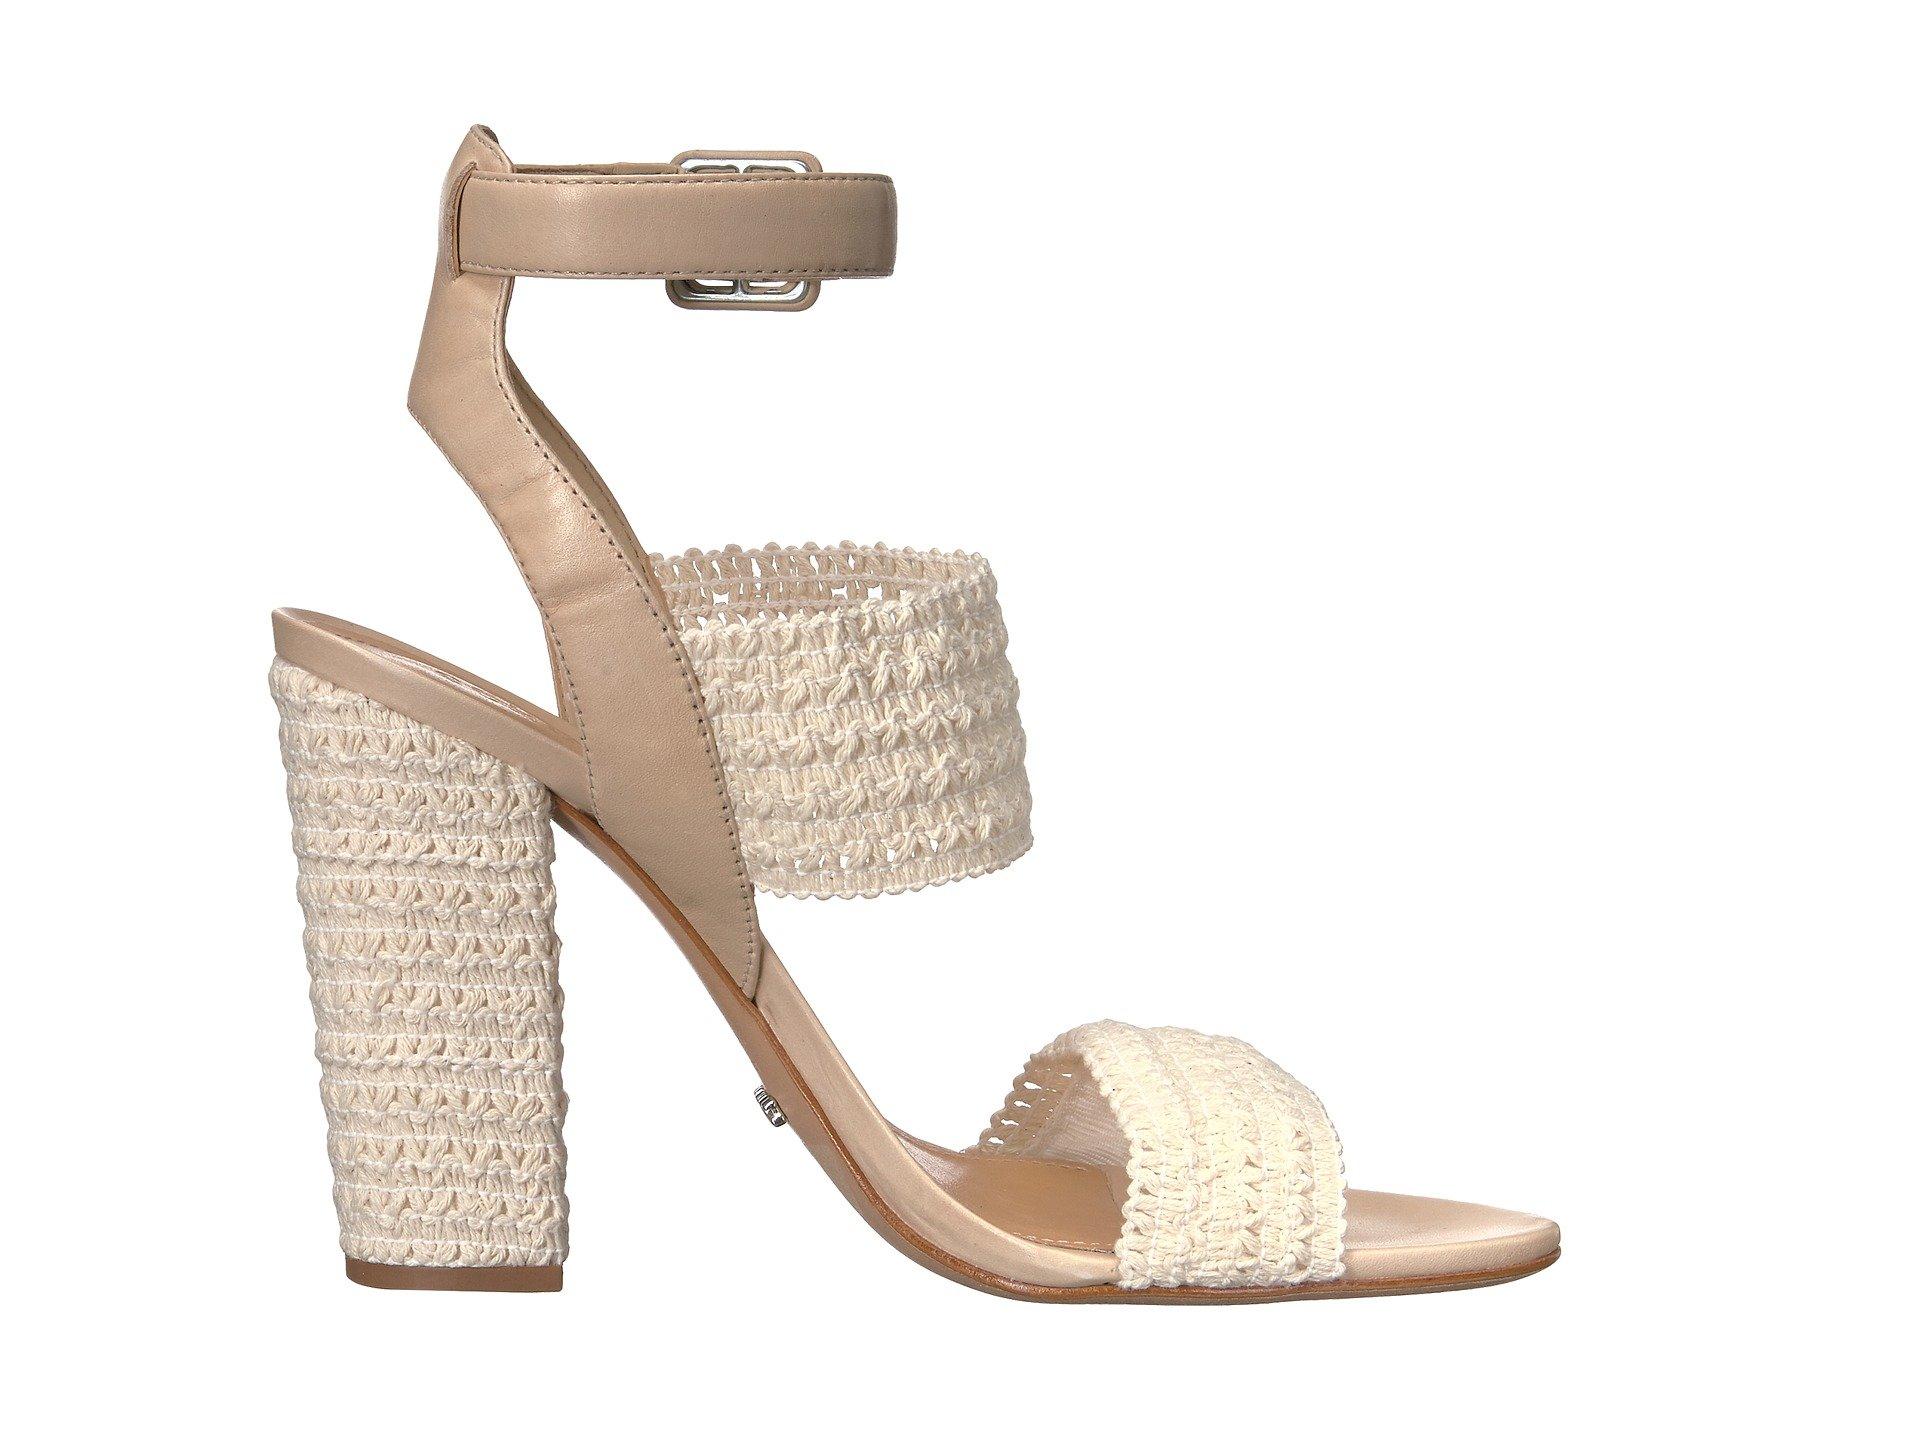 068f550b019 Schutz Glendy Vanila Cru Woven Open Toe Ankle Strap Block Heel ...